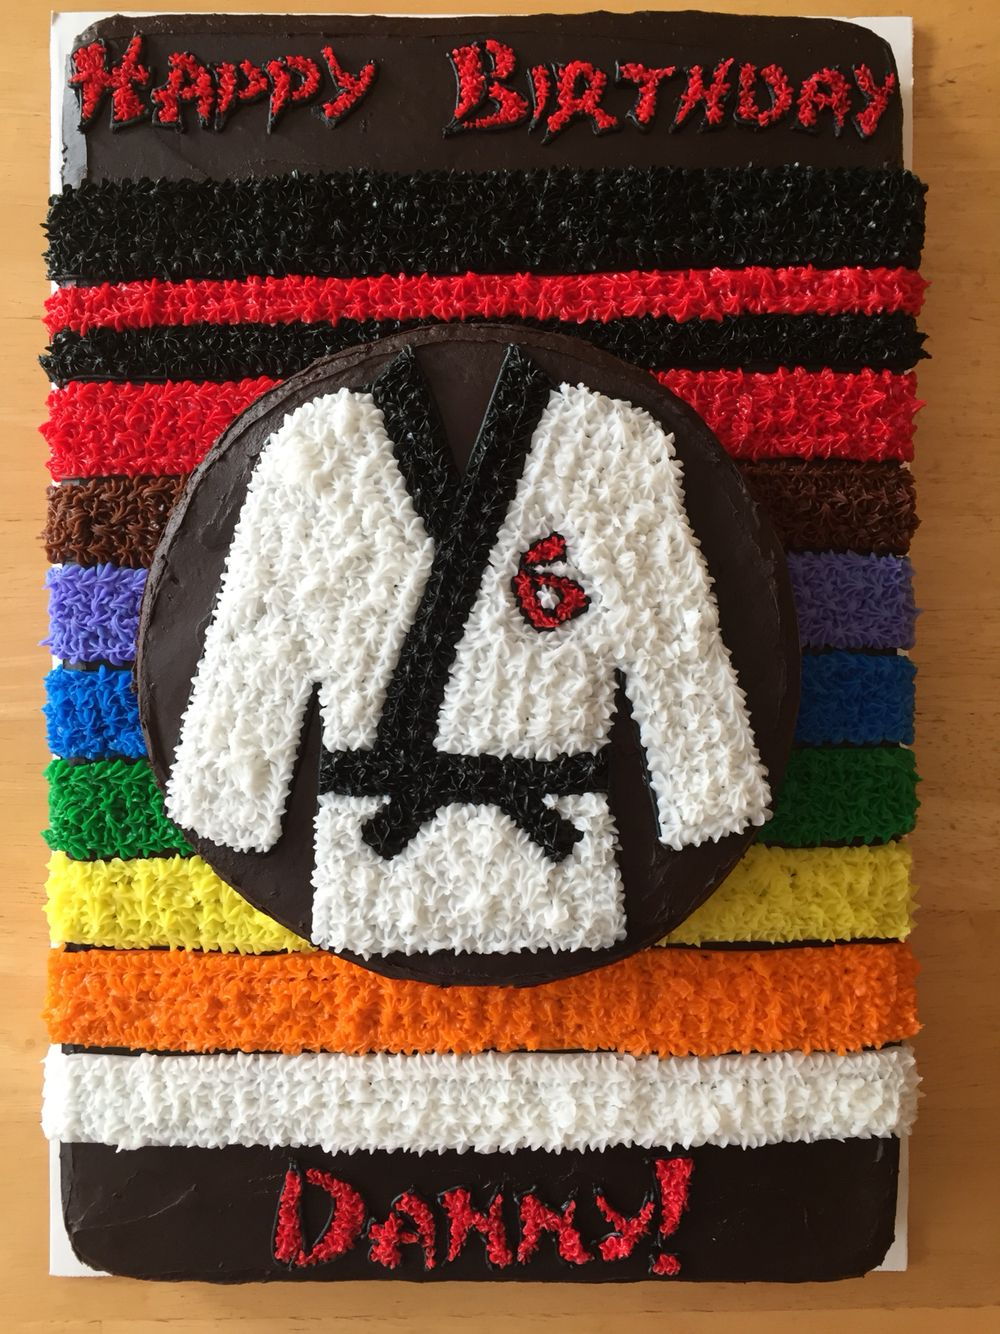 Taekwondo kuchen pinterest geschenkideen kuchen und geschenkideen kinder - Tortendeko kinder ...